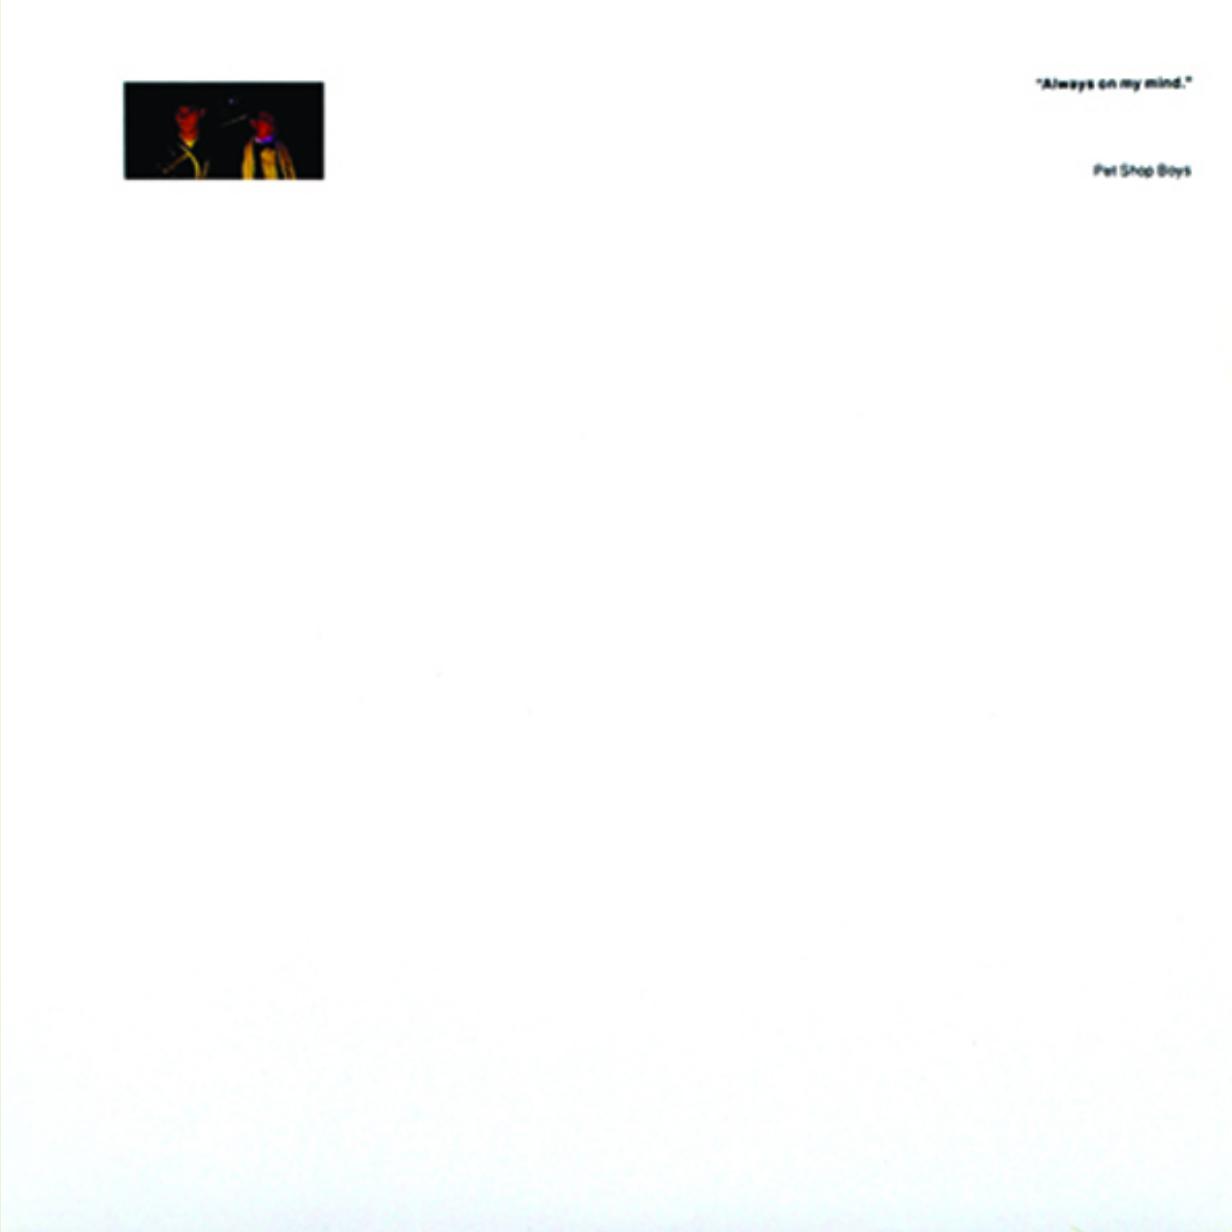 The Lowdown: Pet Shop Boys - Always On My Mind